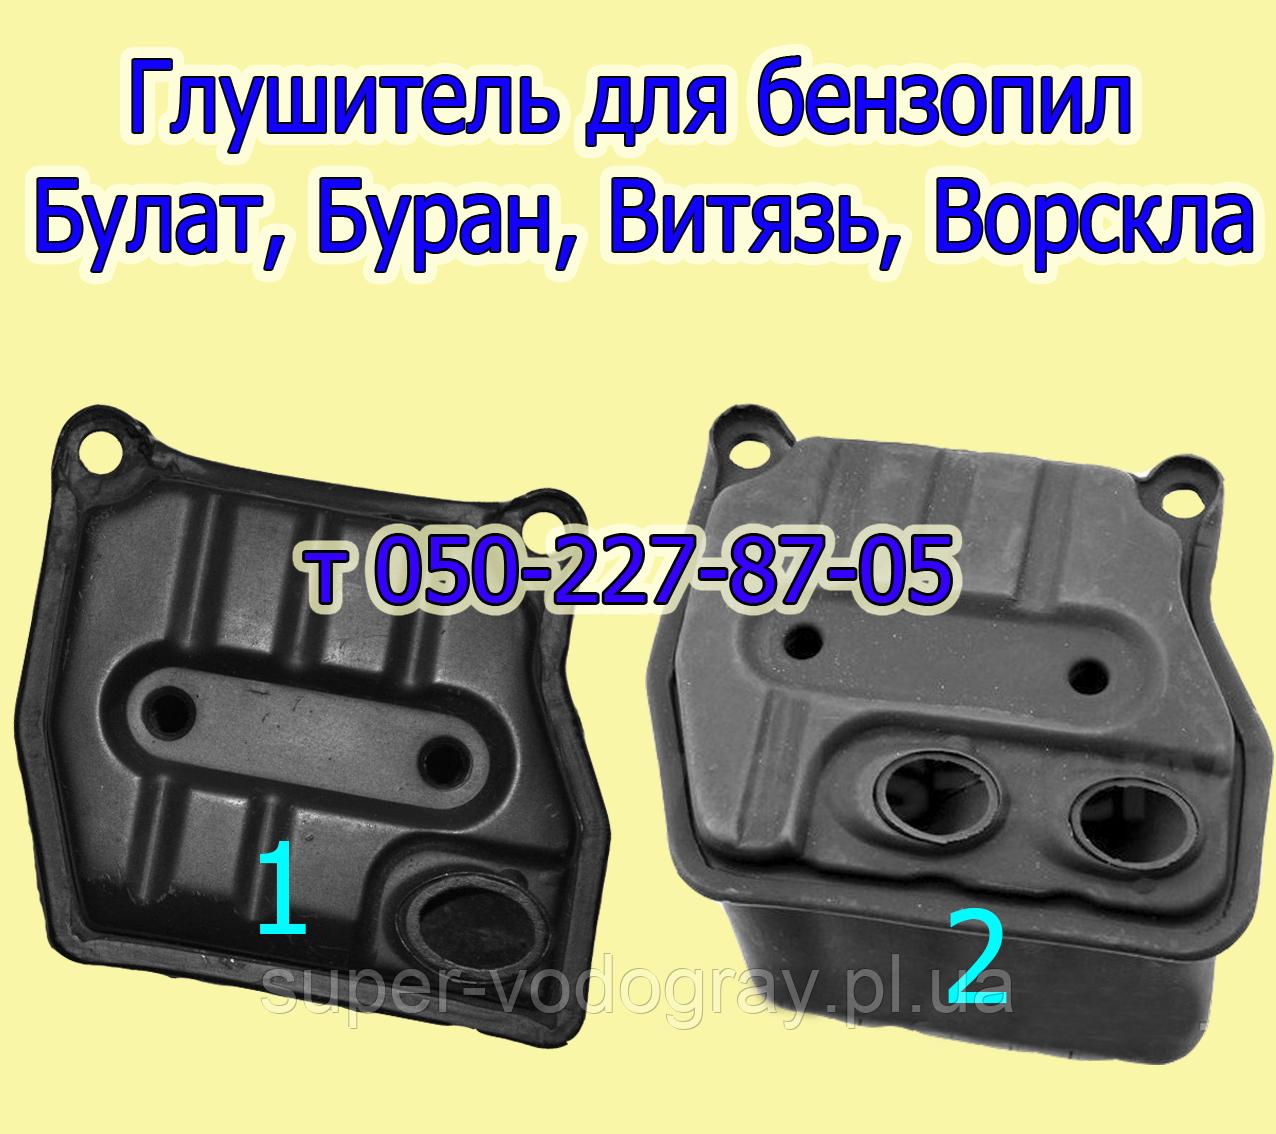 Глушитель (выхлопная) для бензопил Буран, Булат, Витязь, Ворскла